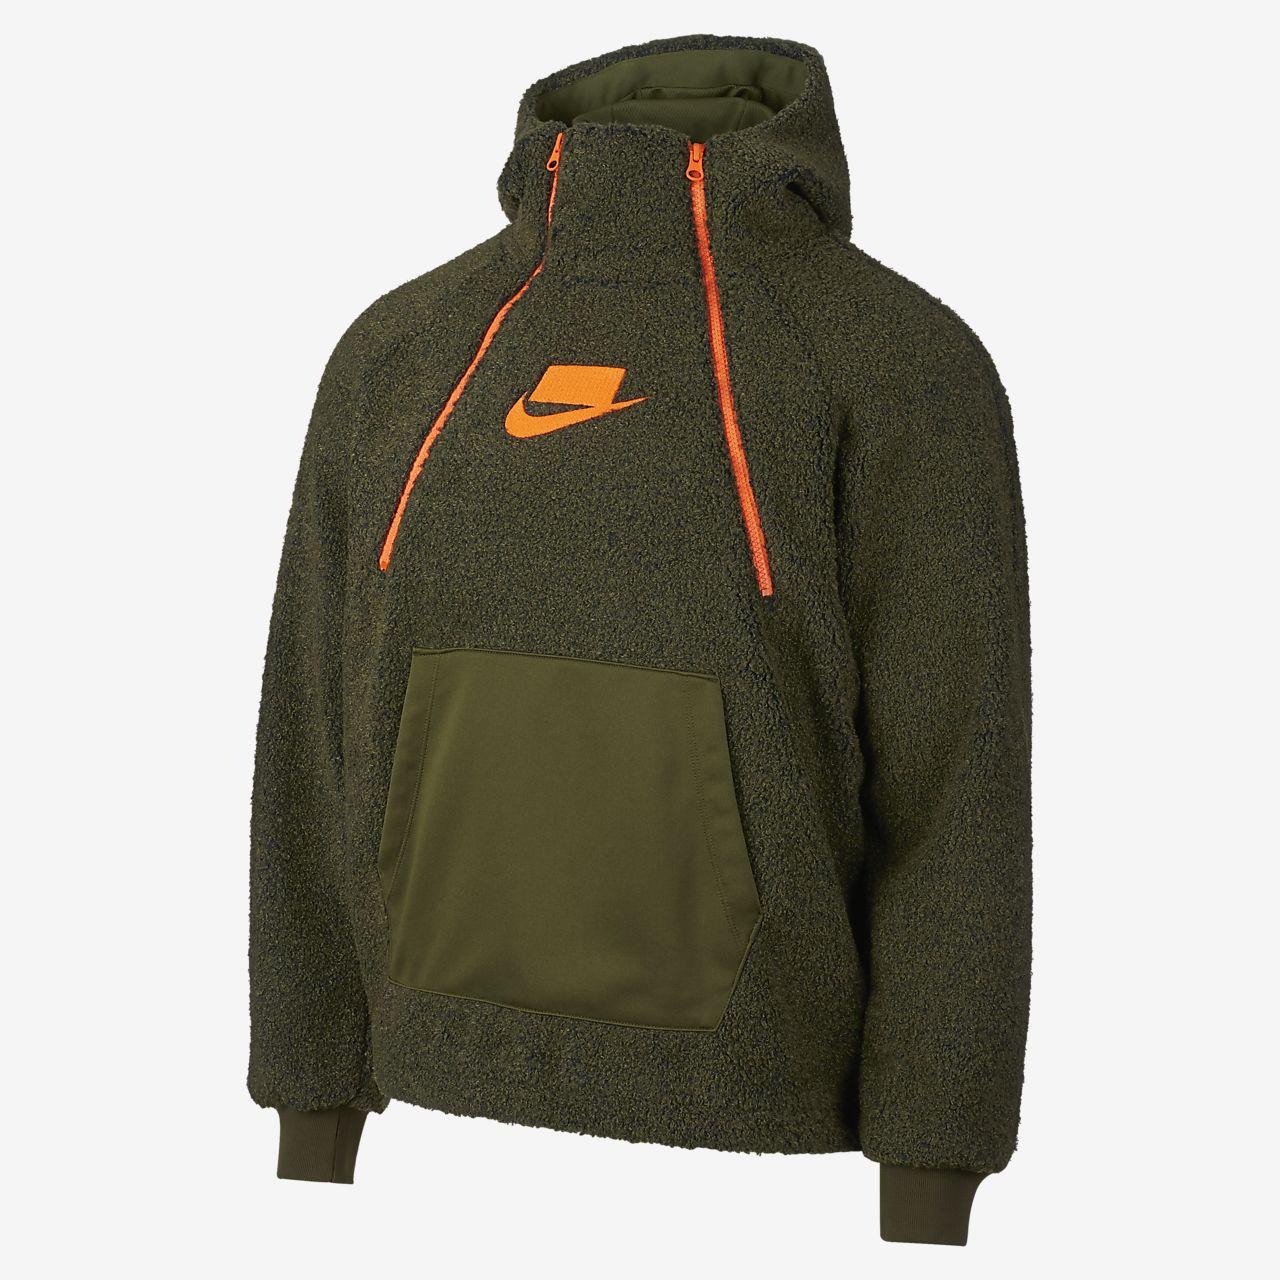 Nike sportswear mixed color hoodie